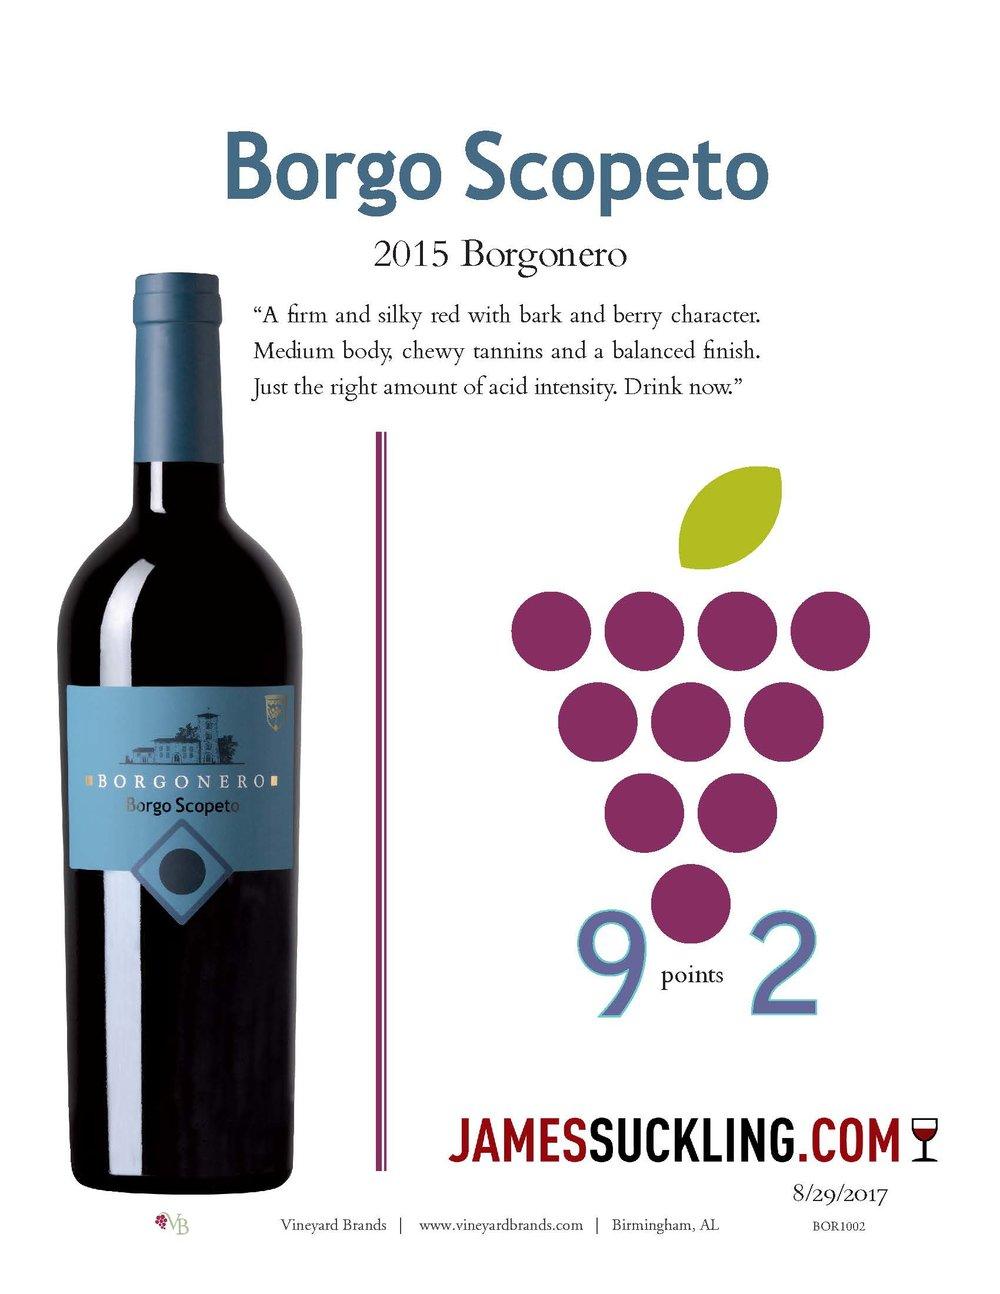 BorgoScopetoBorgonero2015.jpg